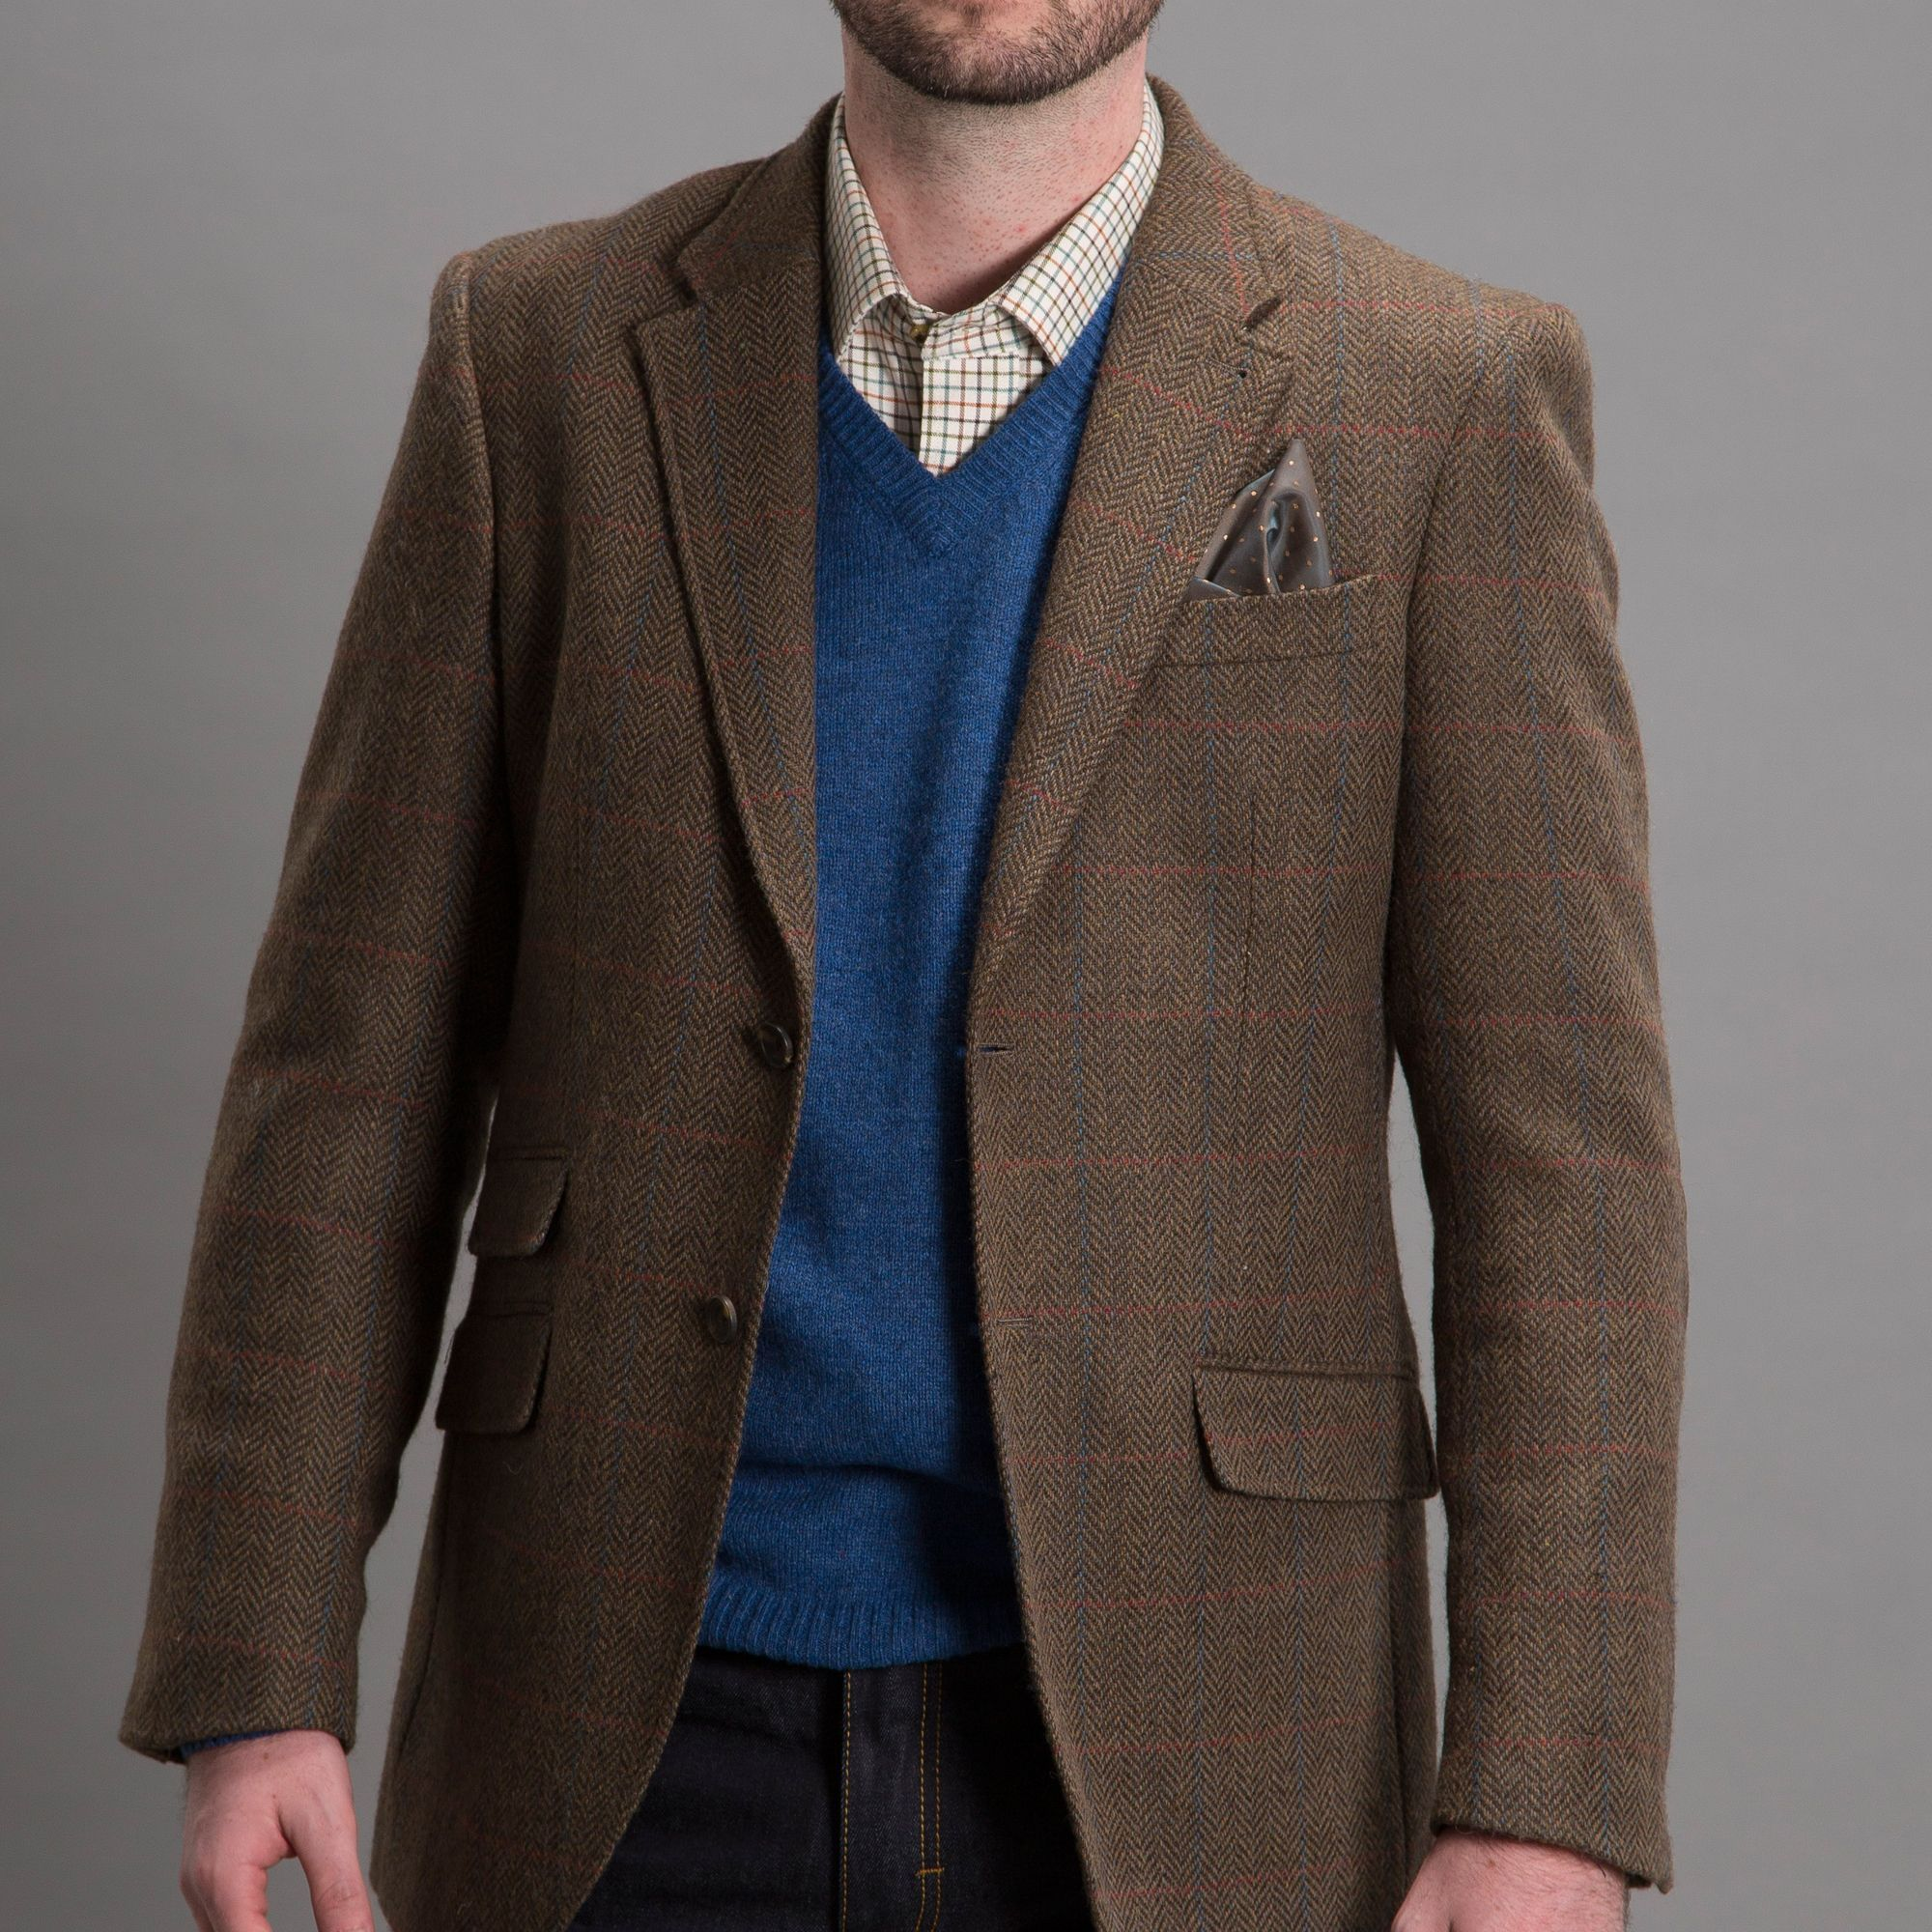 HARVEY & JONES 'Nick' Wool Mix Brown Blazer - Blazers & Jackets - Tailoring